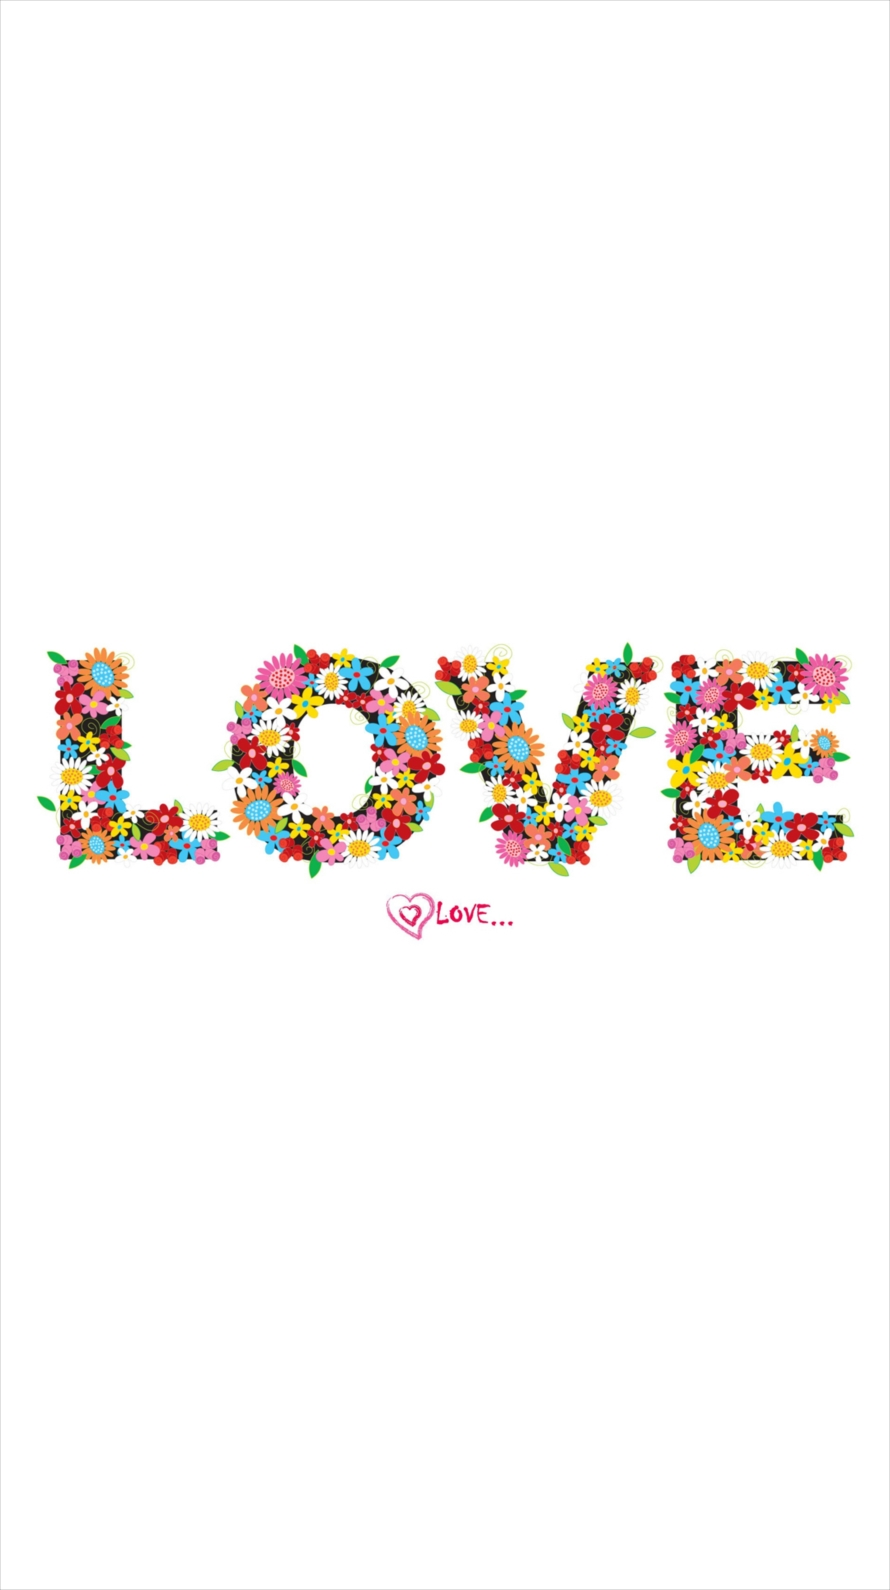 Loveロゴ Iphone6壁紙 Wallpaperbox